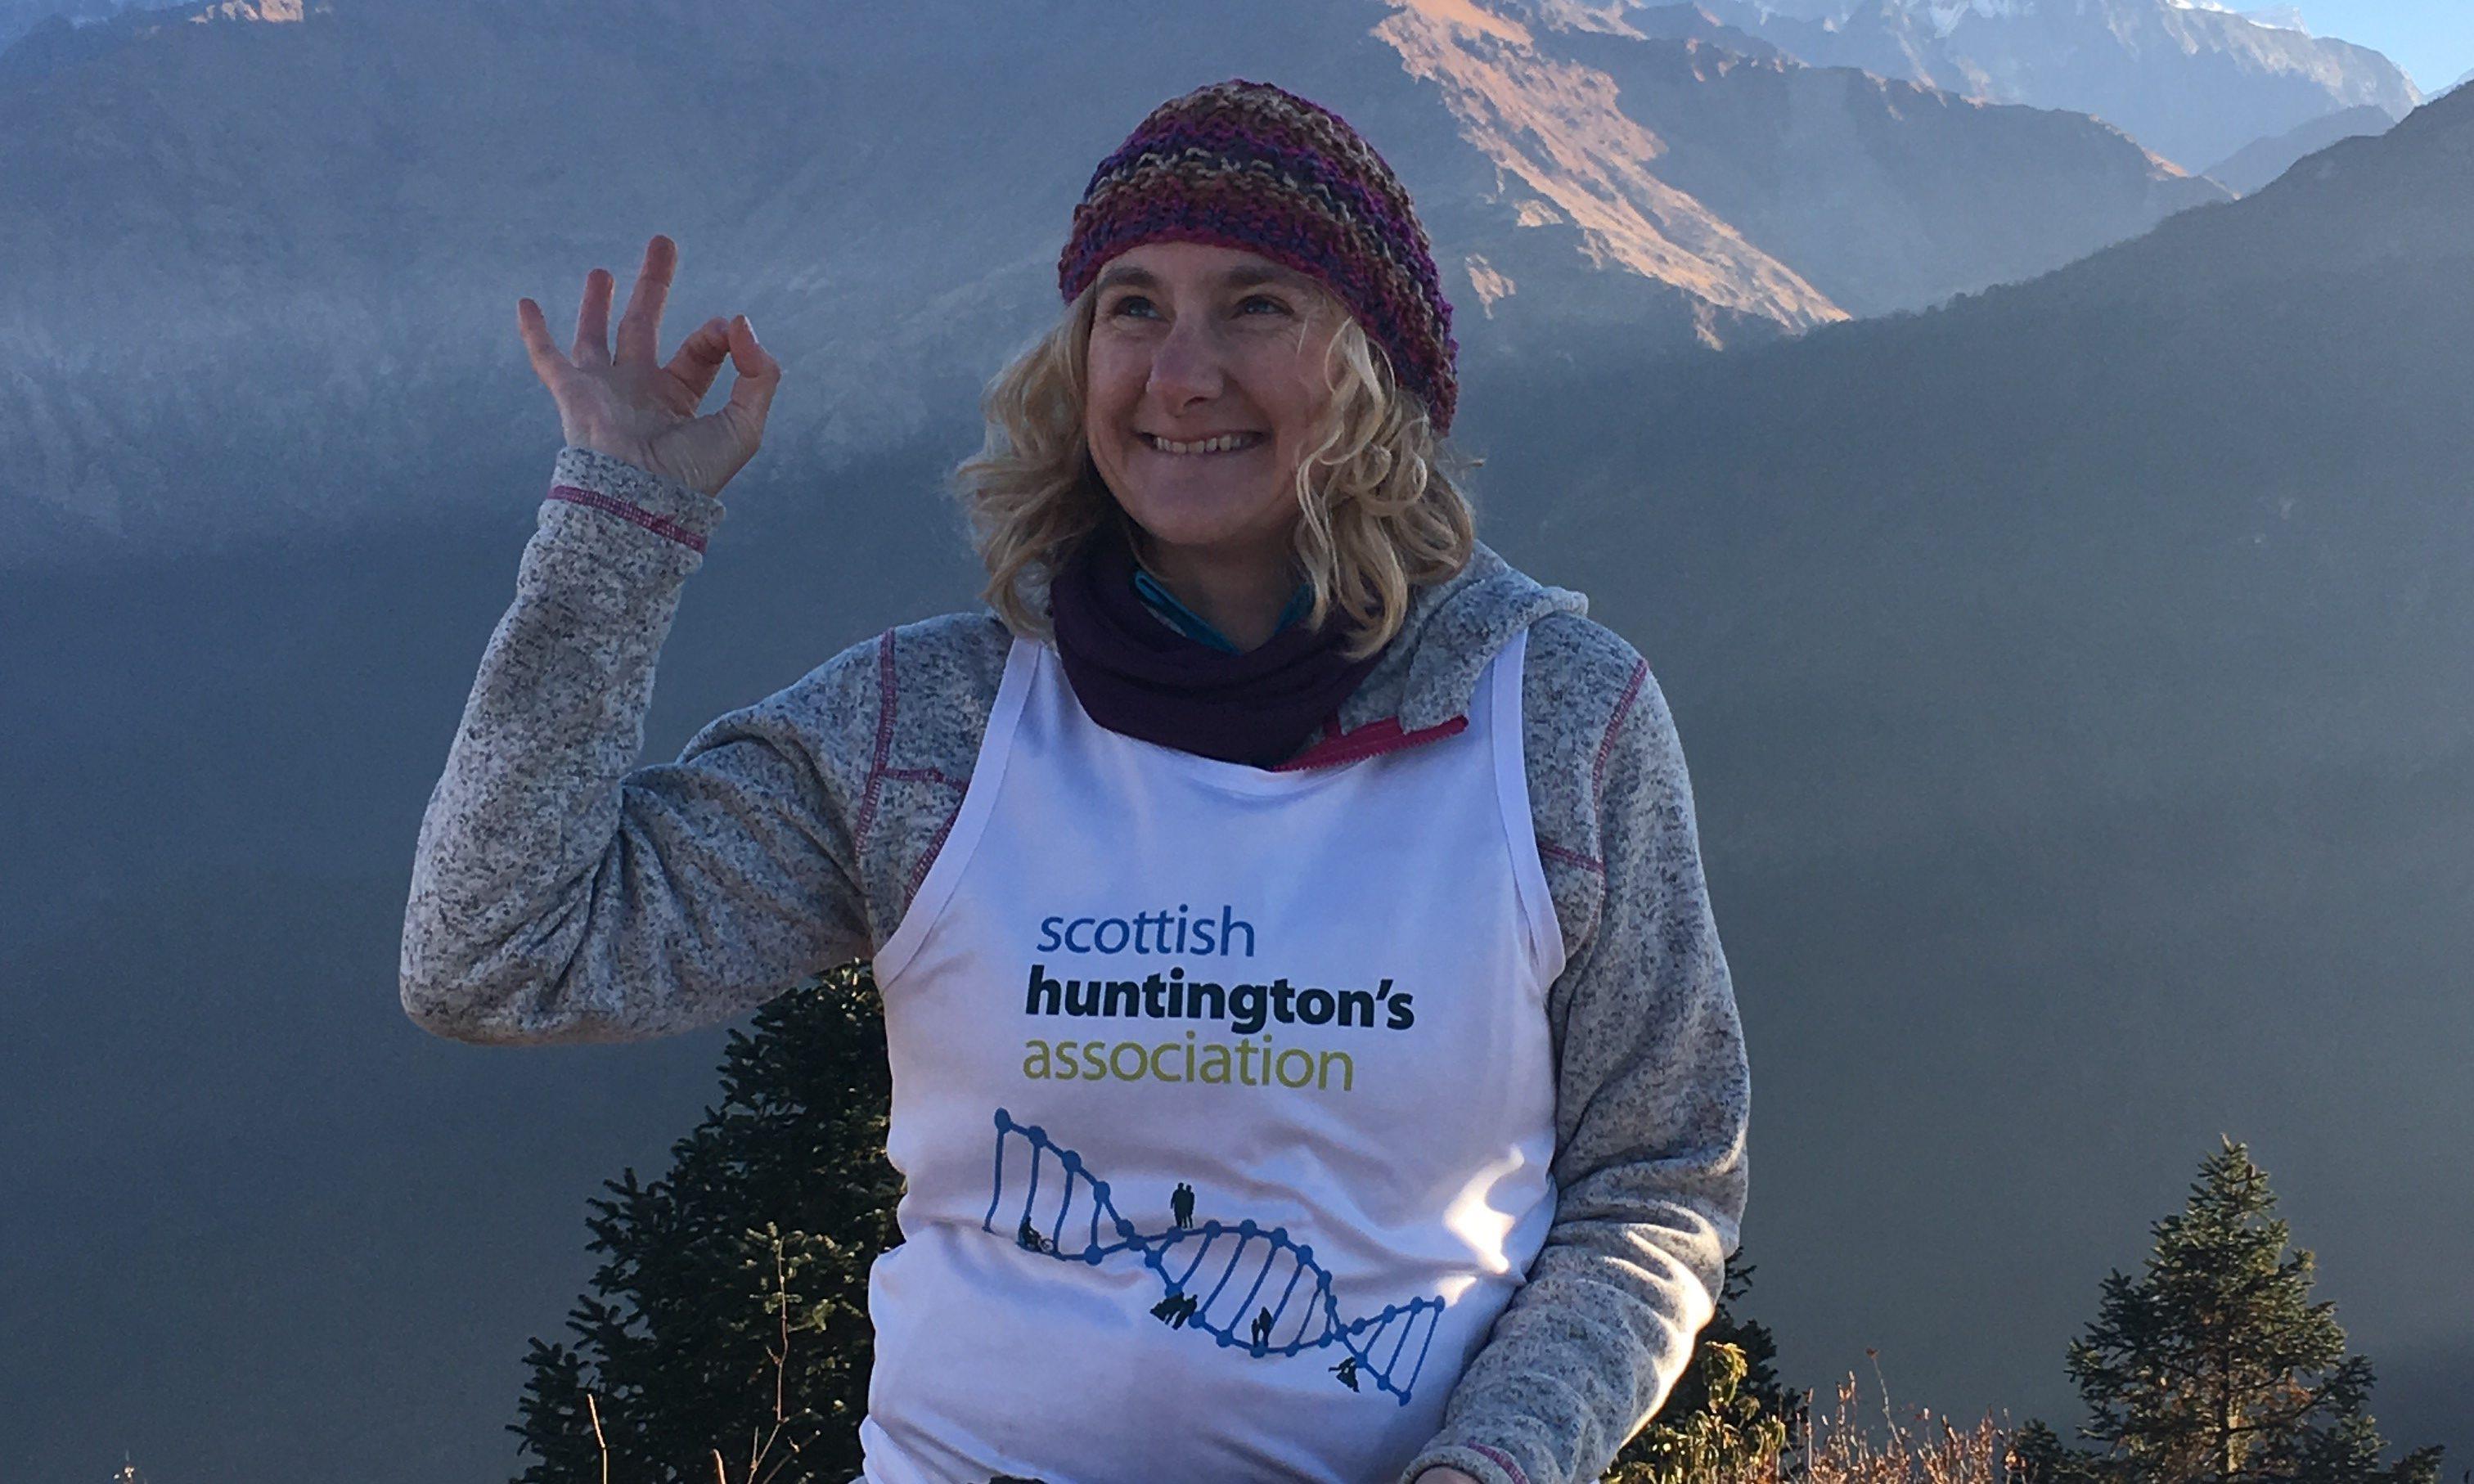 Marie Short, made an MBE, trekked in Nepal to raise money for Scottish Huntingtons Association.